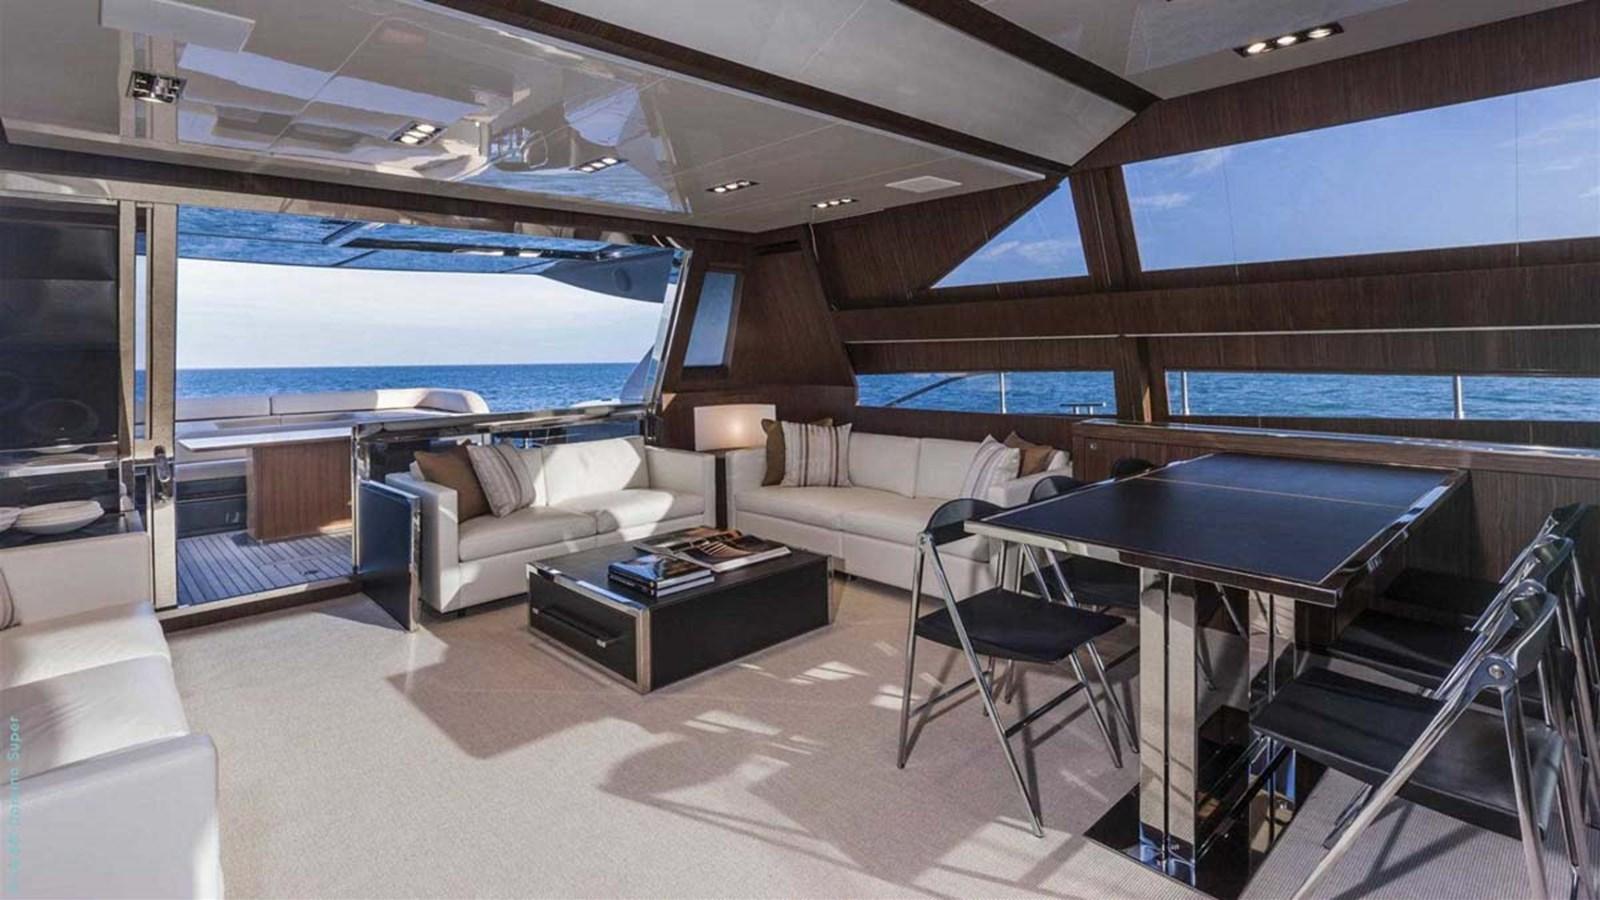 8711-Riva 88 Domino Super 2017 RIVAL YACHTS INC  Motor Yacht 2851170